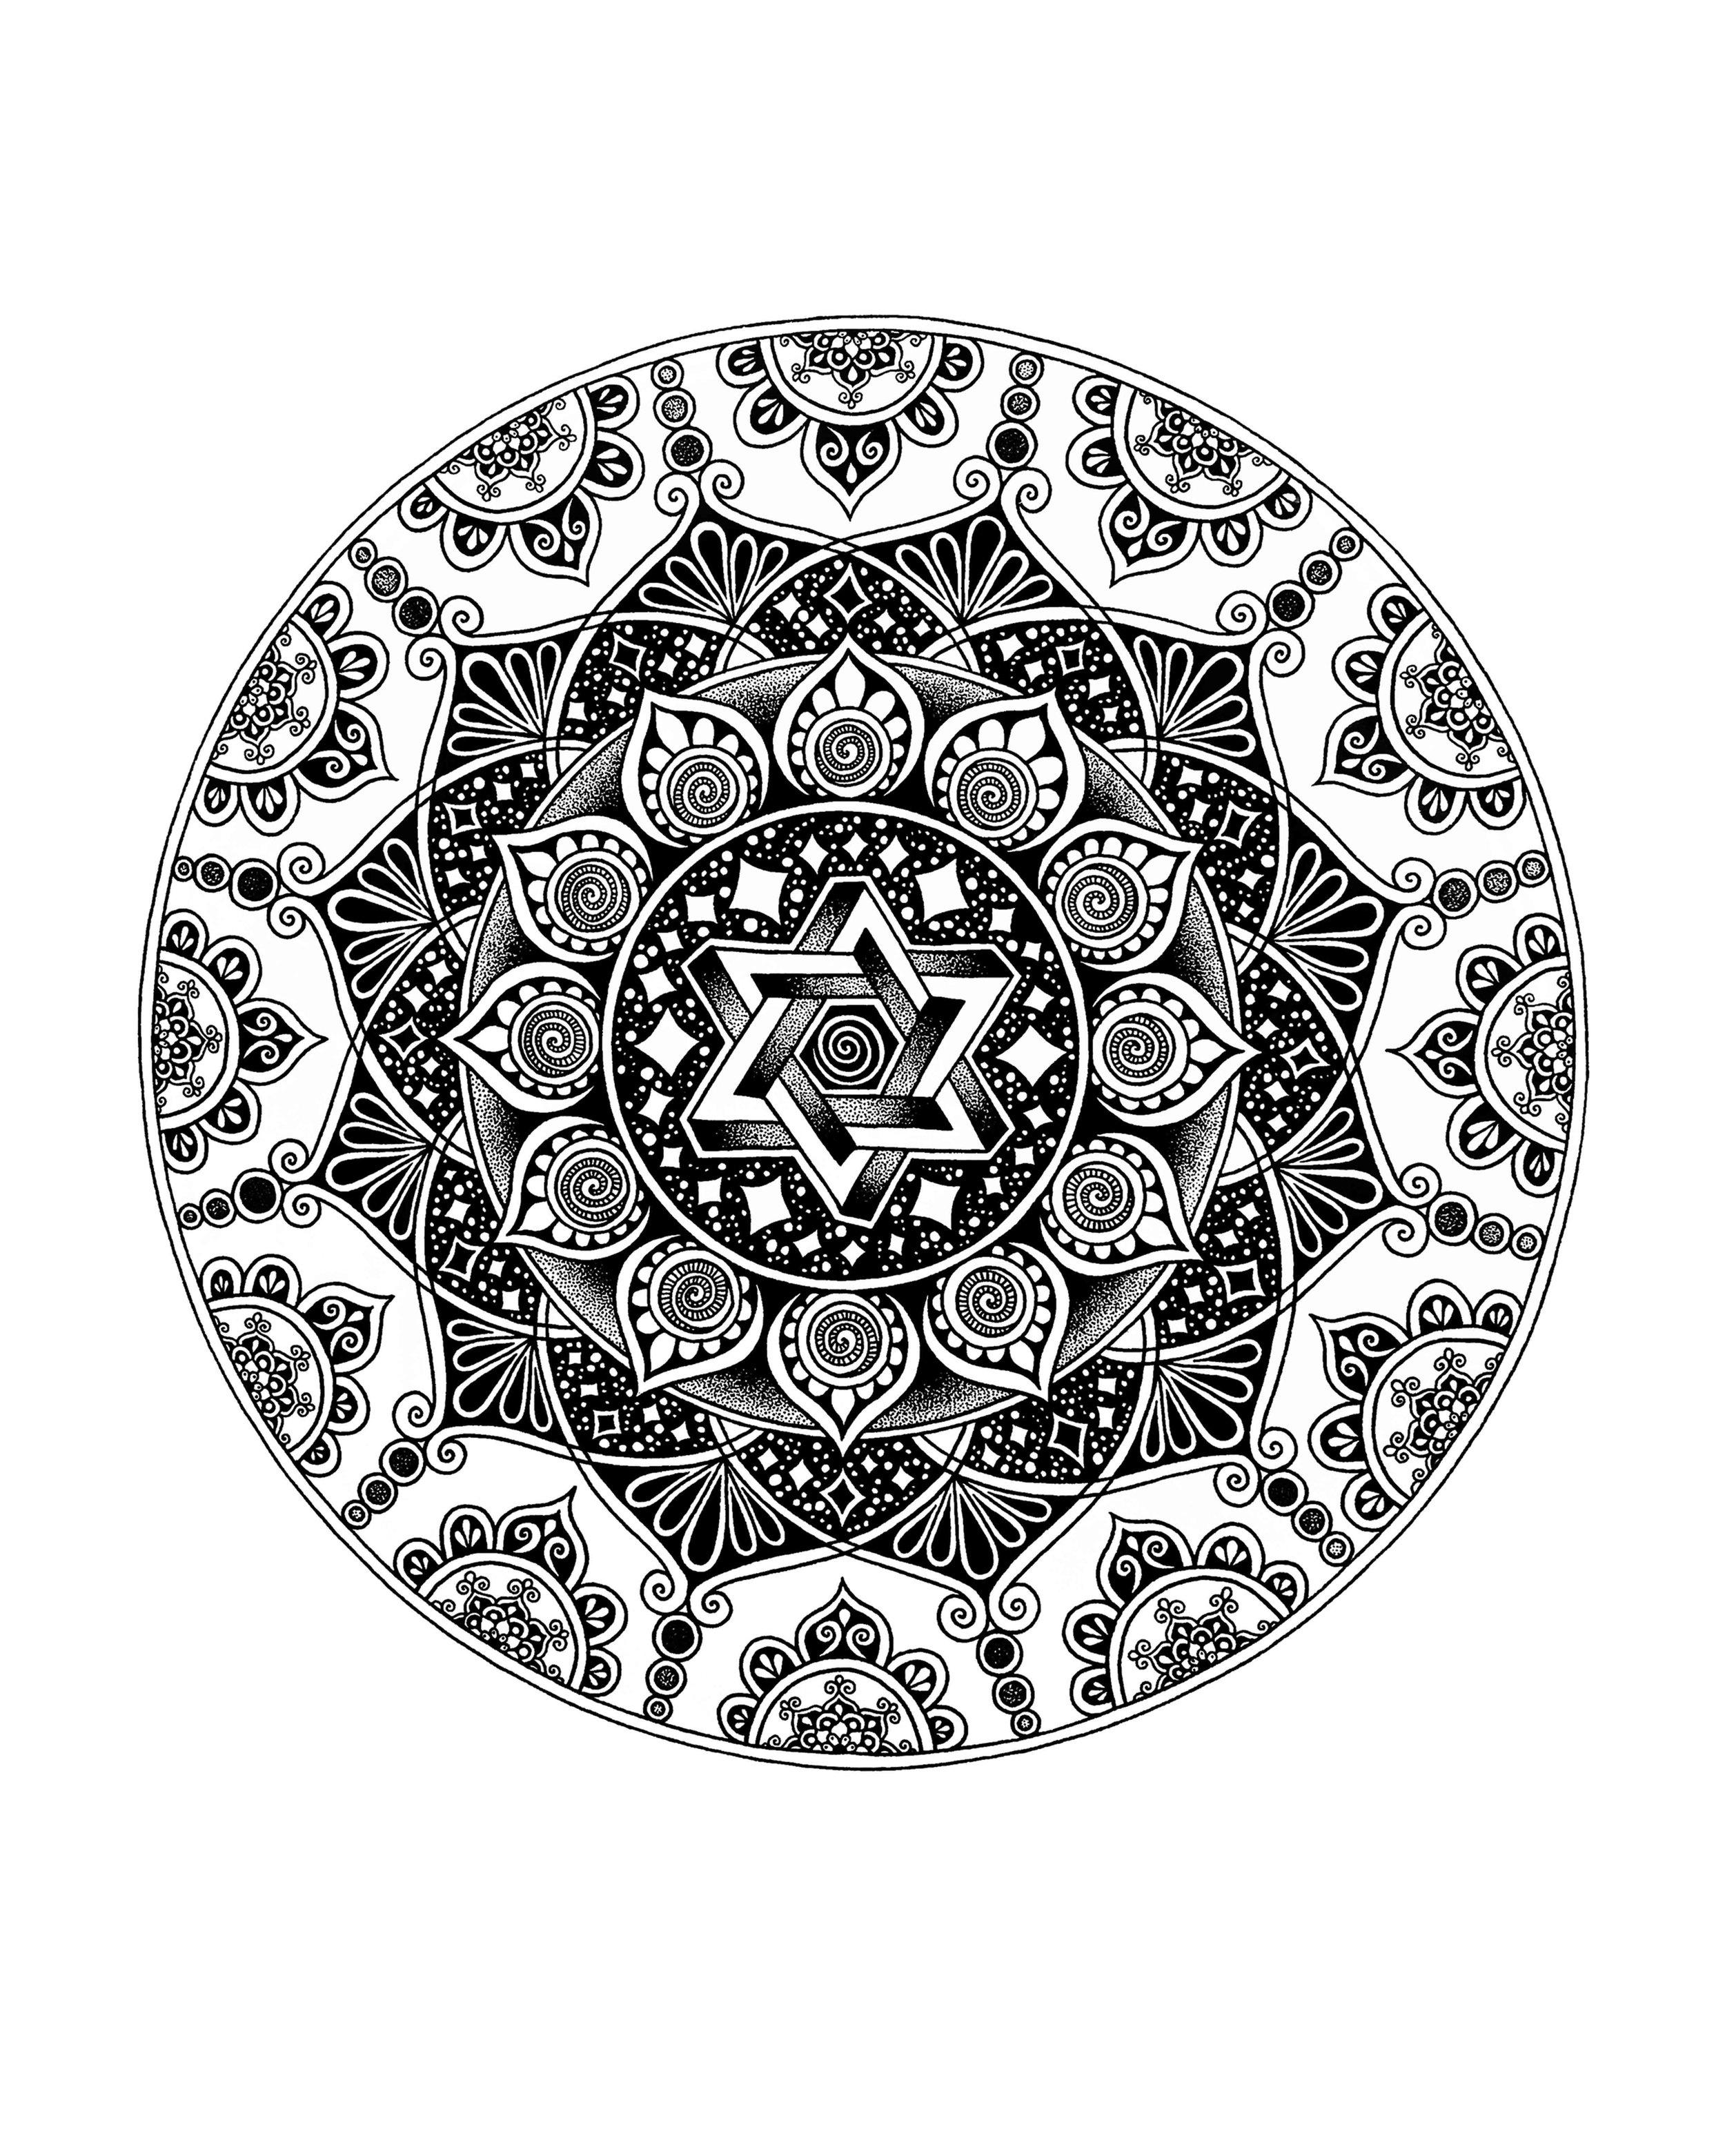 8x10 - Cosmic Illusion Mandala - fortyonehundred copy.jpg